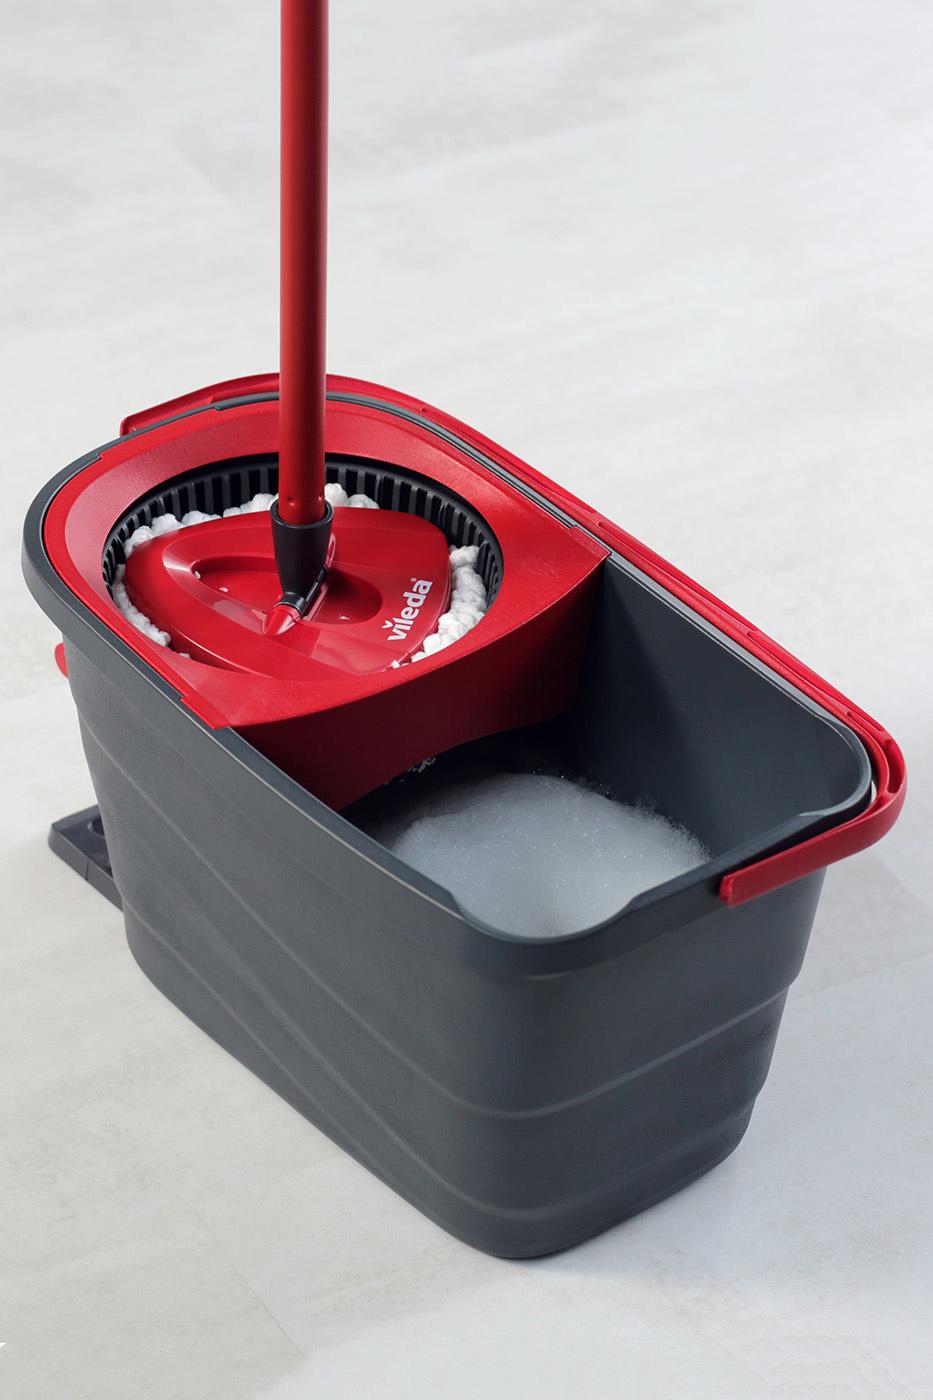 Набор для уборки Easy Wring&Clean Turbo Smart. Швабра и ведро с отжимом, темно-сер. Vileda - фото 4